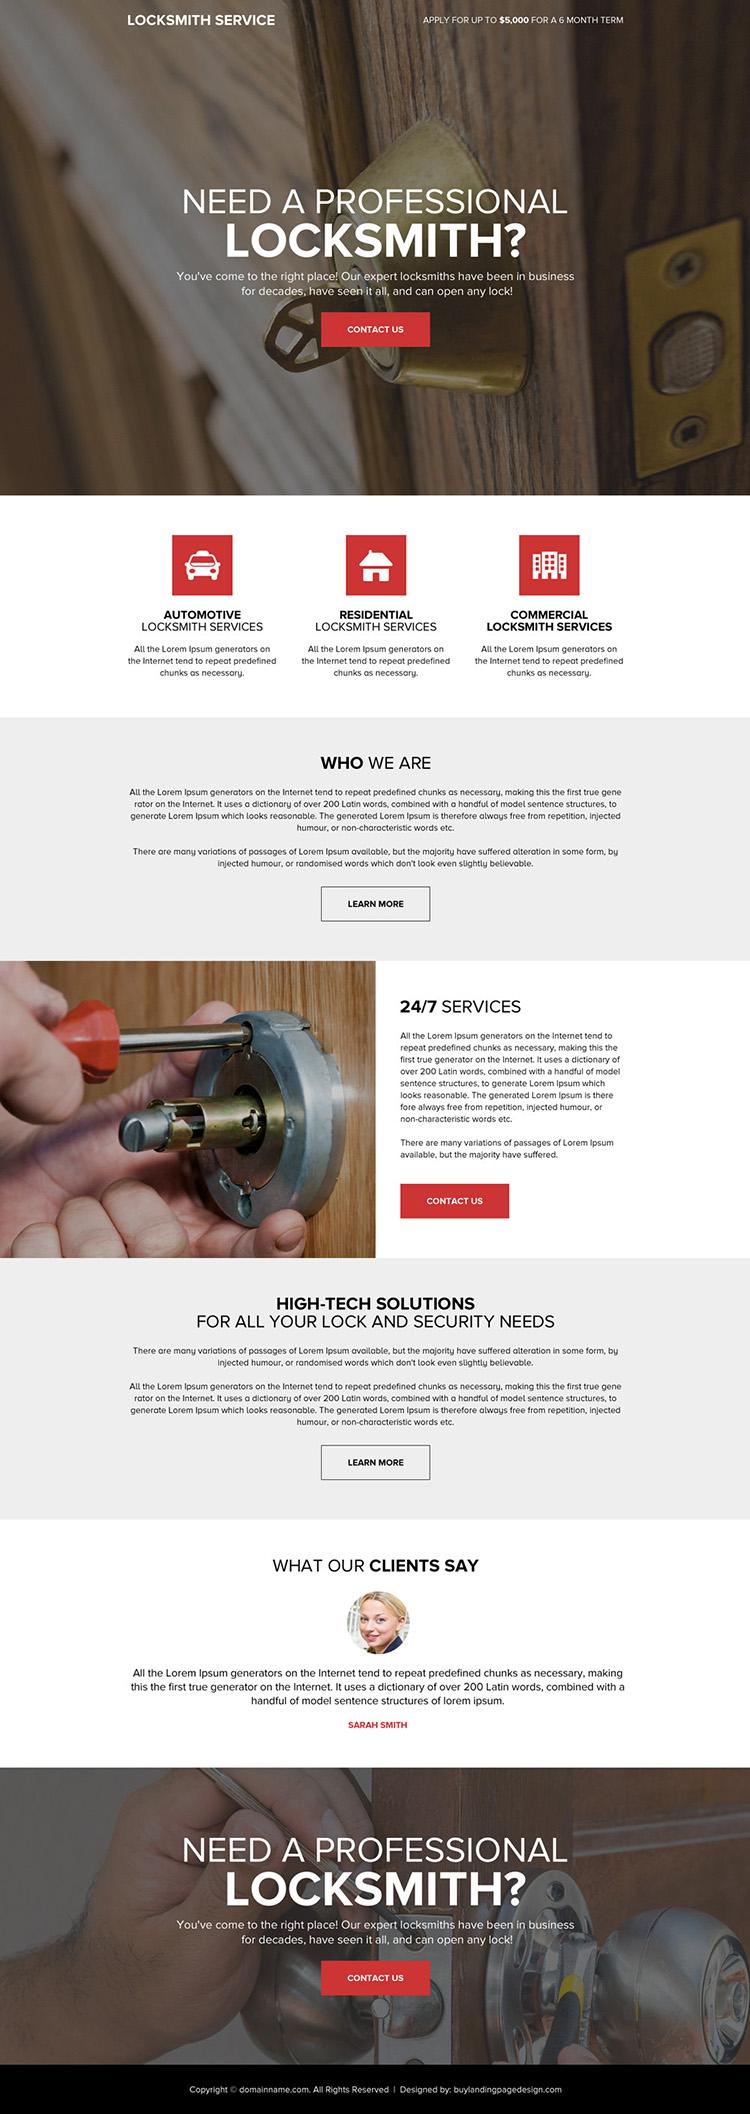 professional locksmith service responsive landing page design